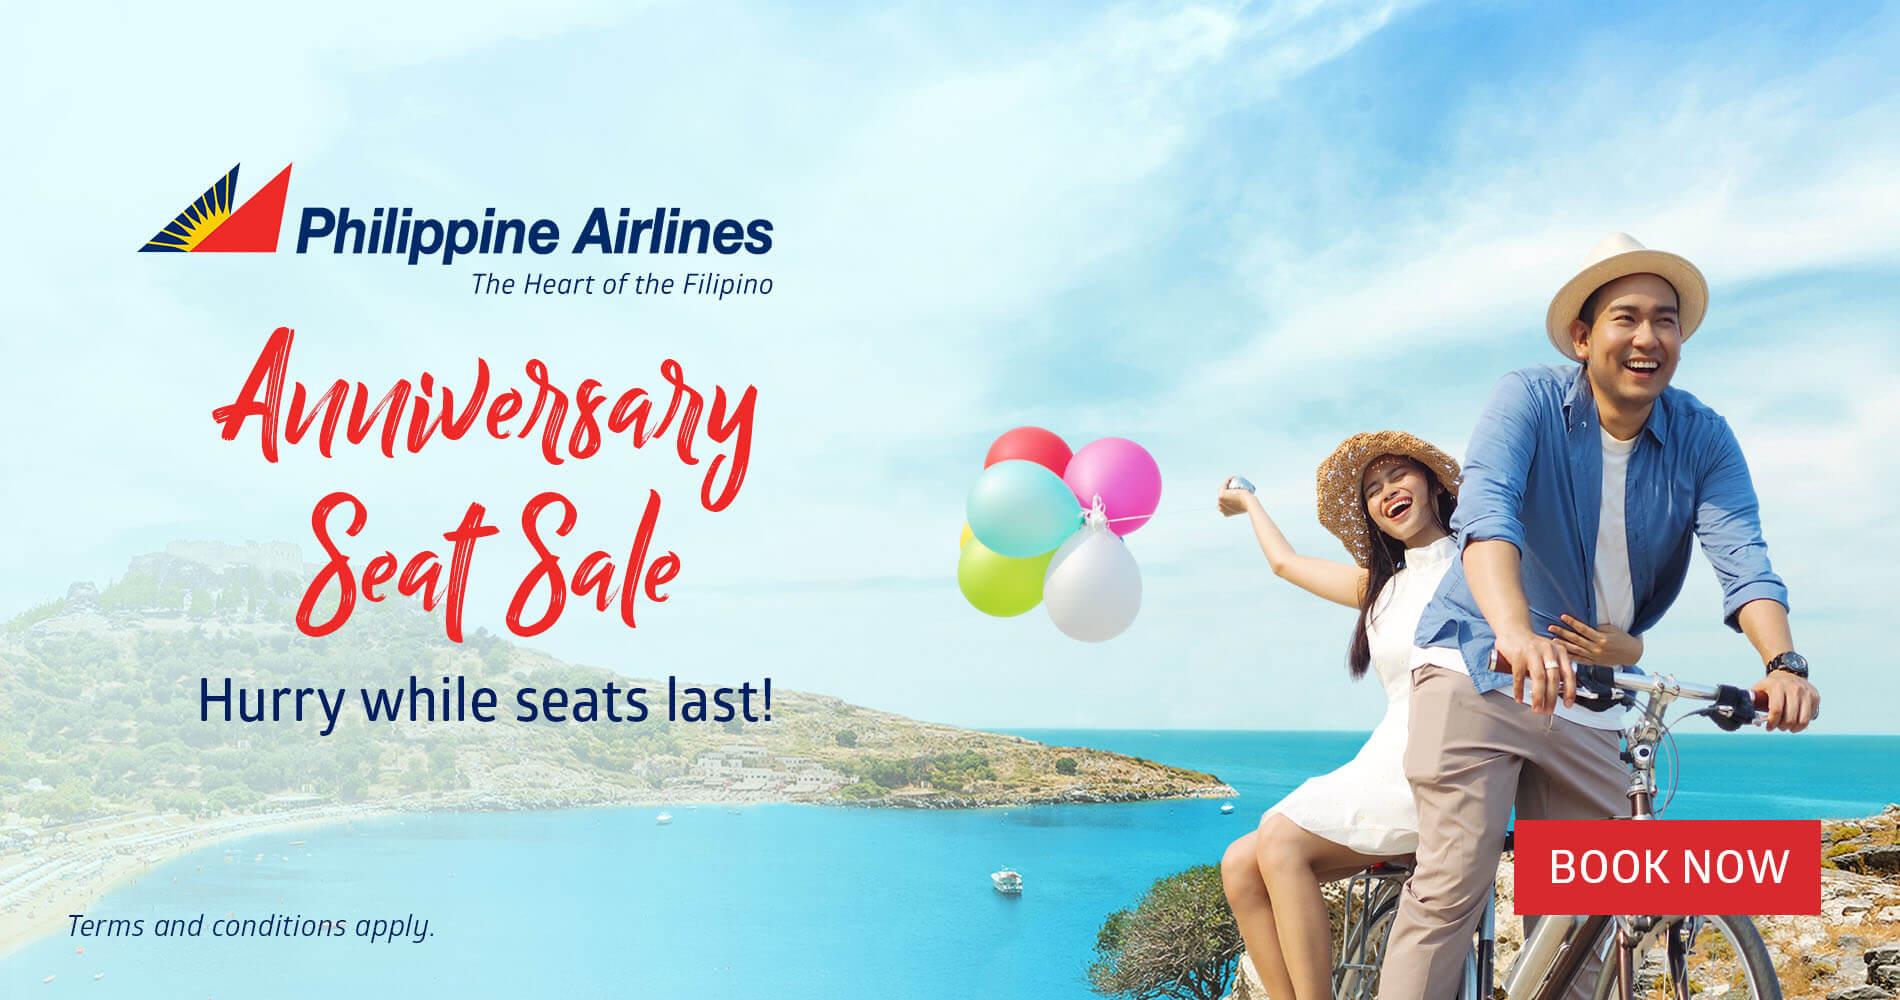 Philippine Airlines Anniversary Seat Sale 1900x1000 00